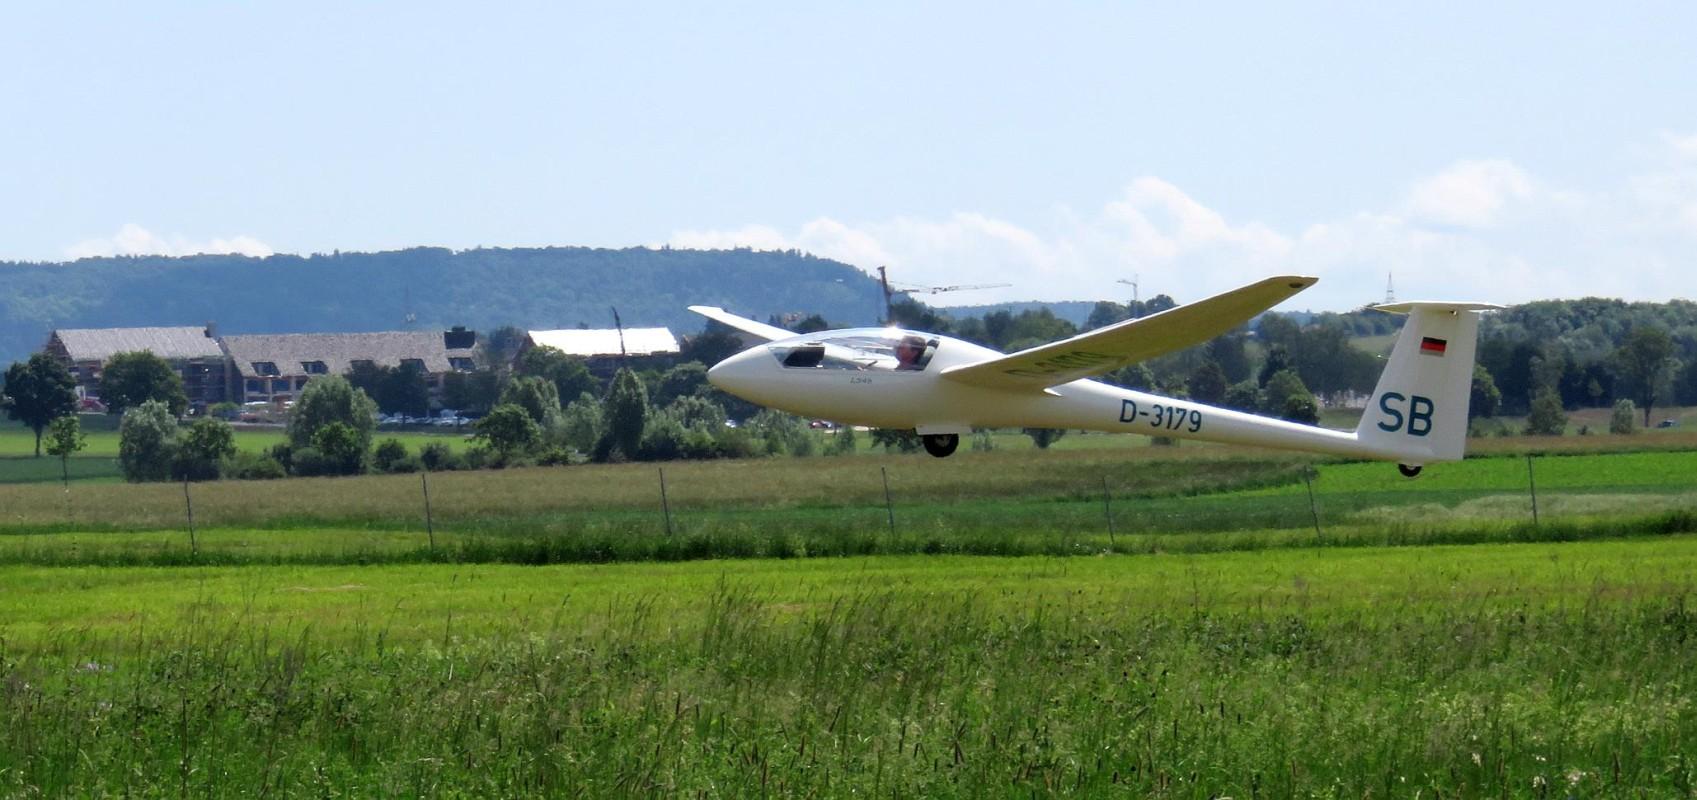 2018-5-50-Alleinflug4-smalll05